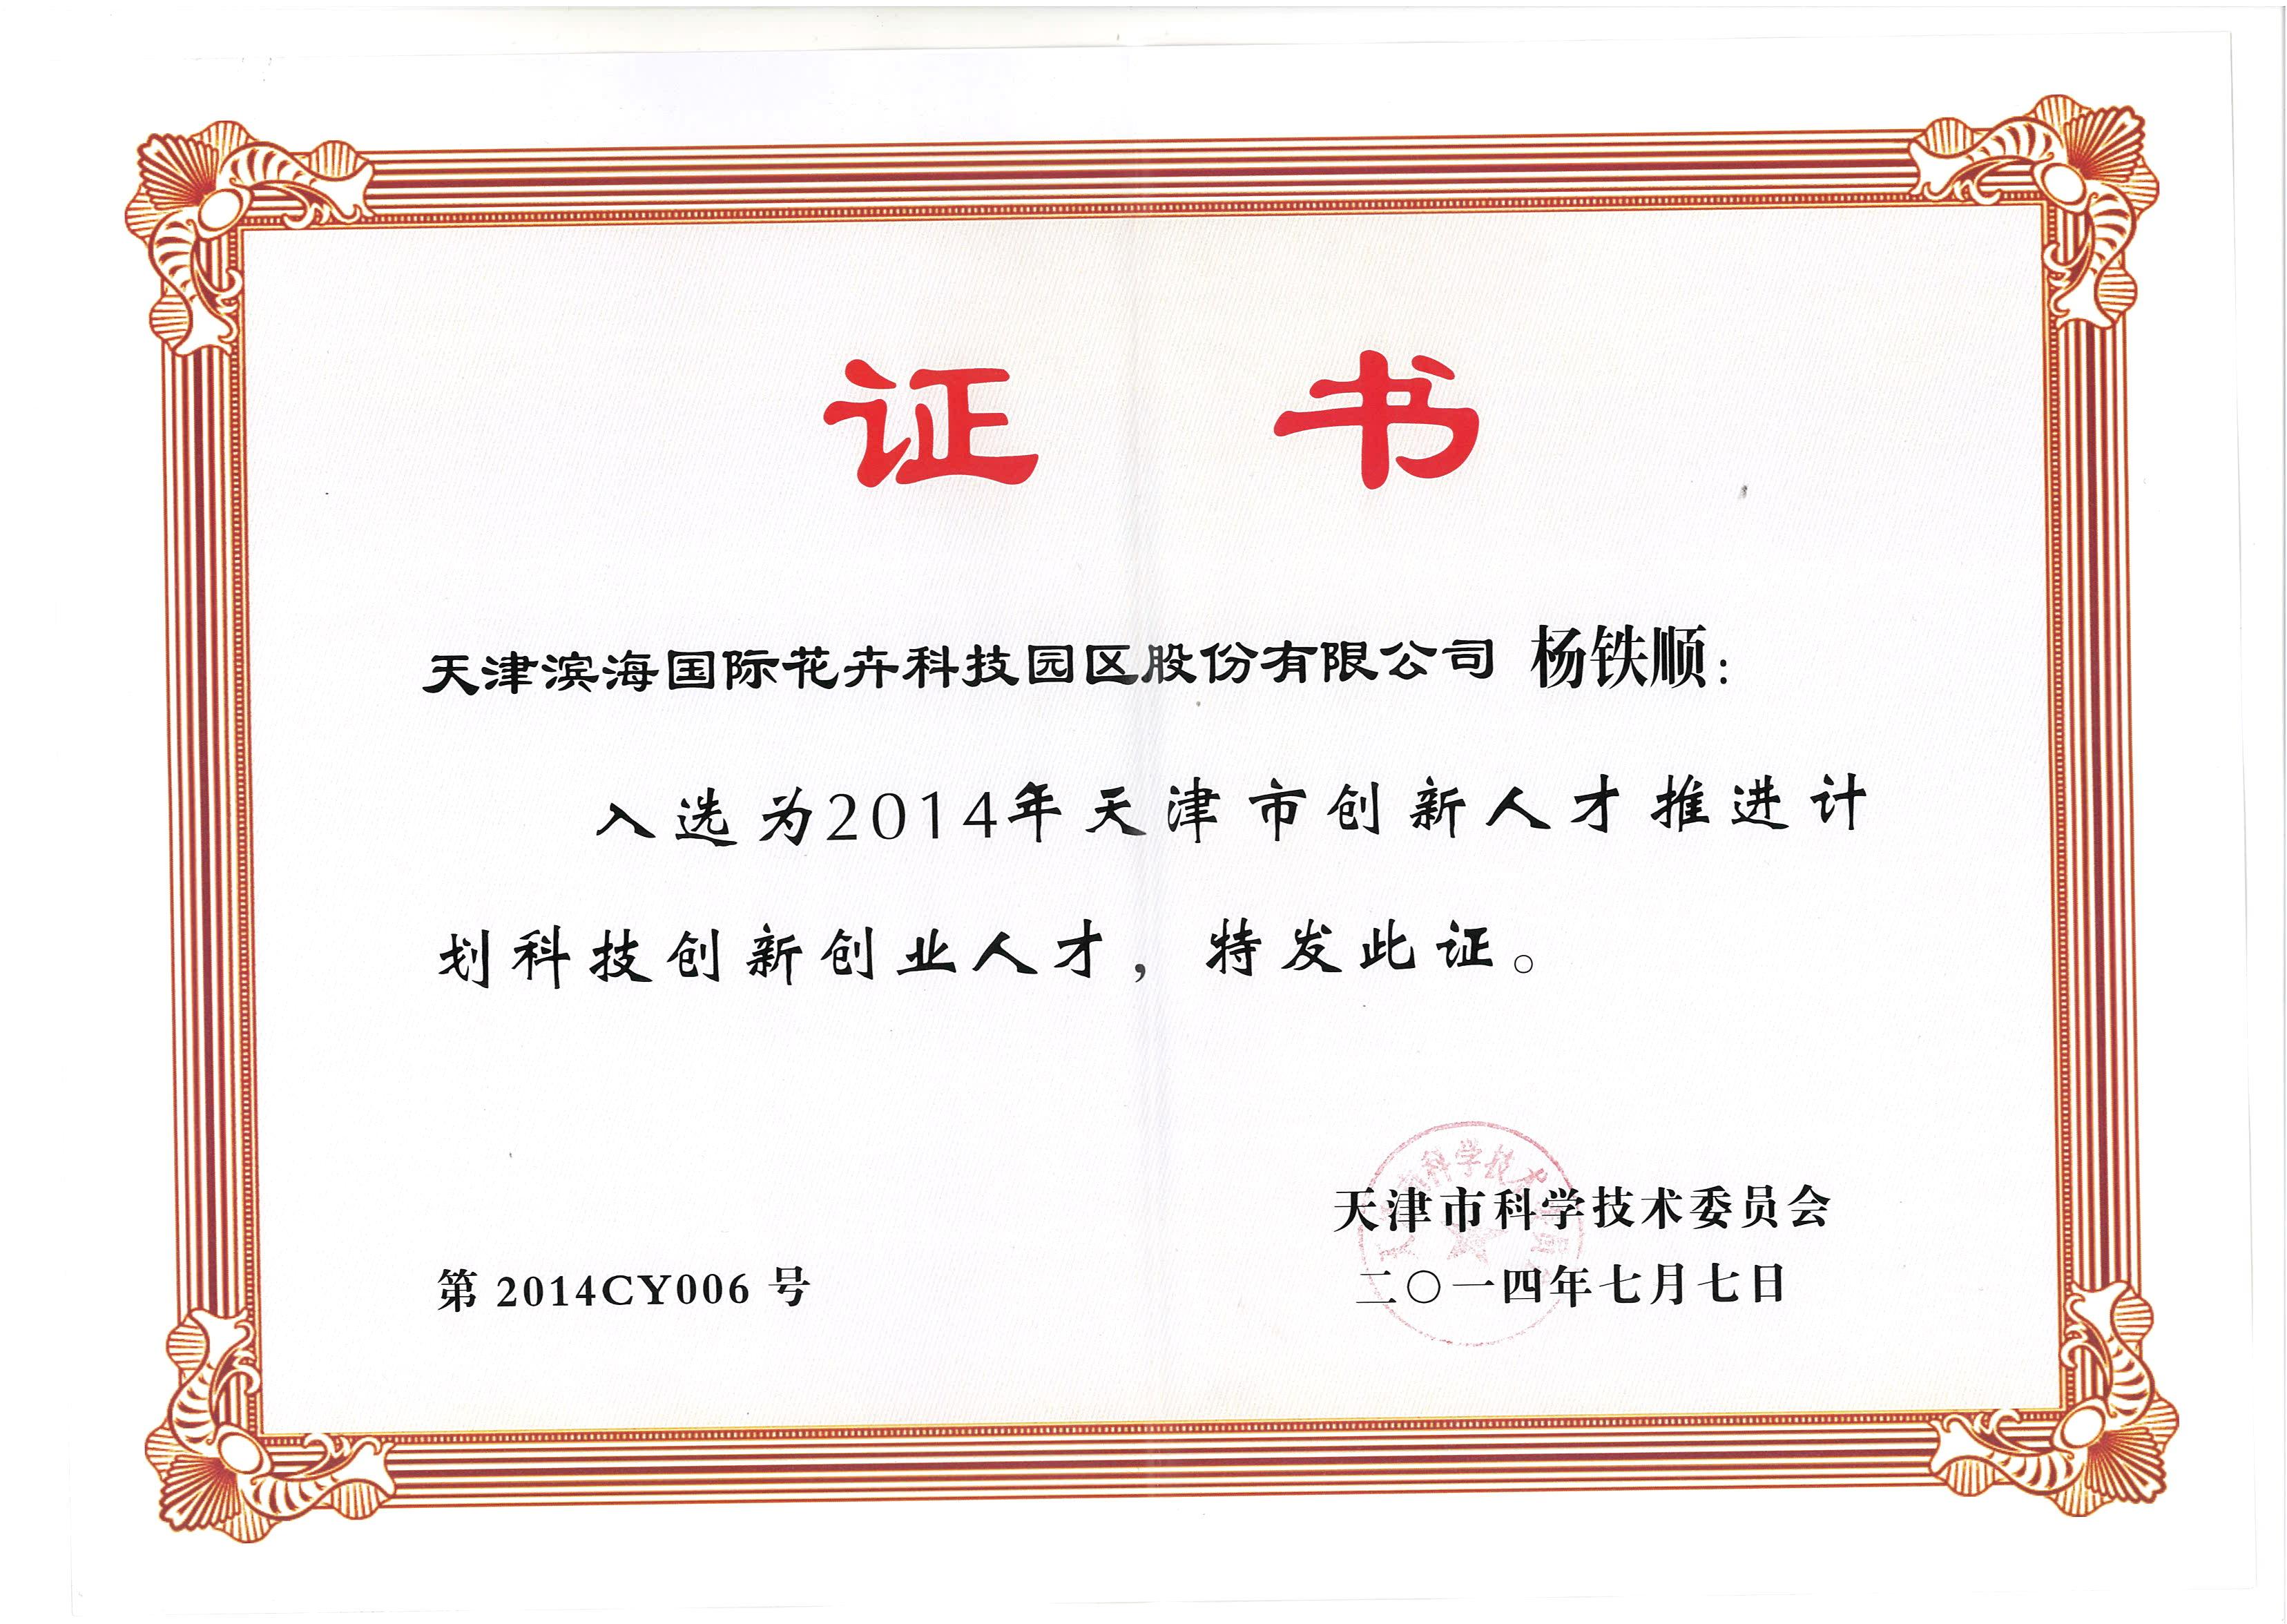 "<div style=""text-align:center;""> 2014年天津市 </div> <div style=""text-align:center;""> 科技创新创业人才 </div>"